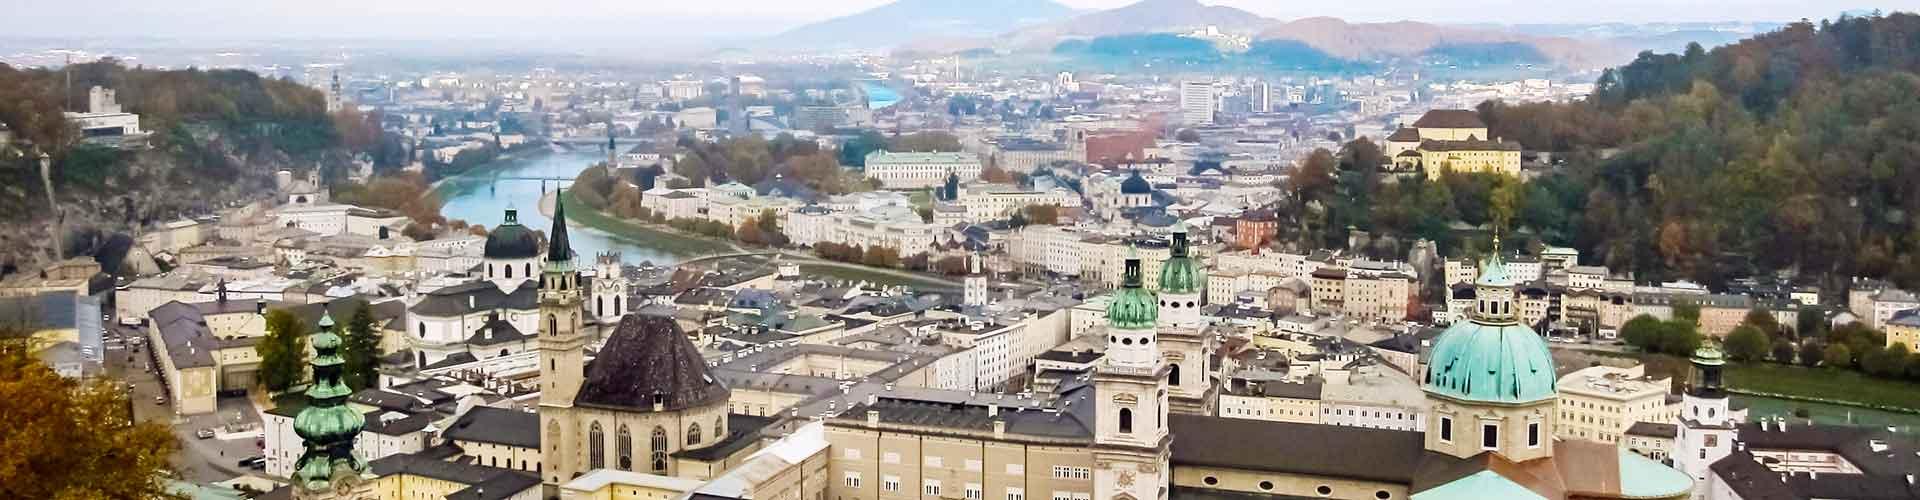 Impression Salzburg